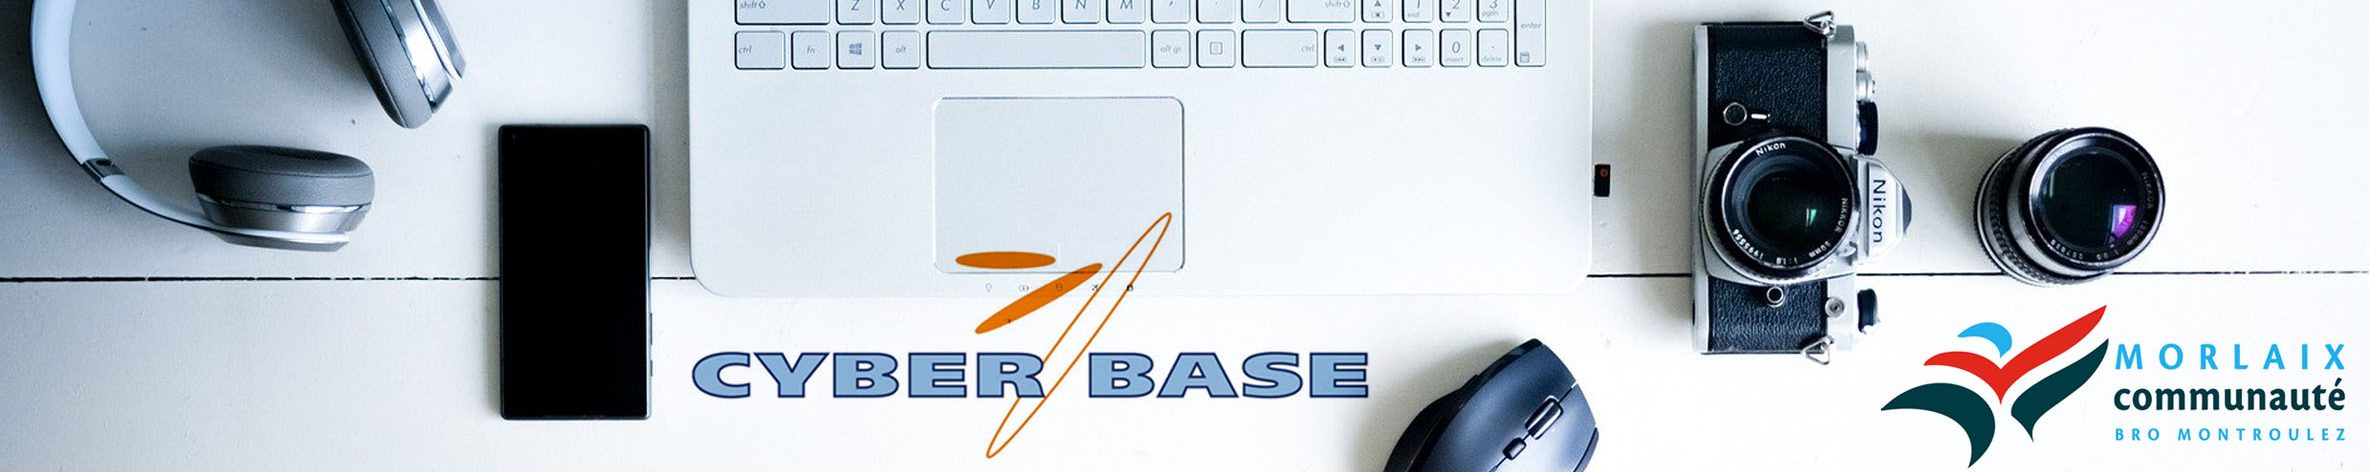 Cyberbase de Morlaix Communauté